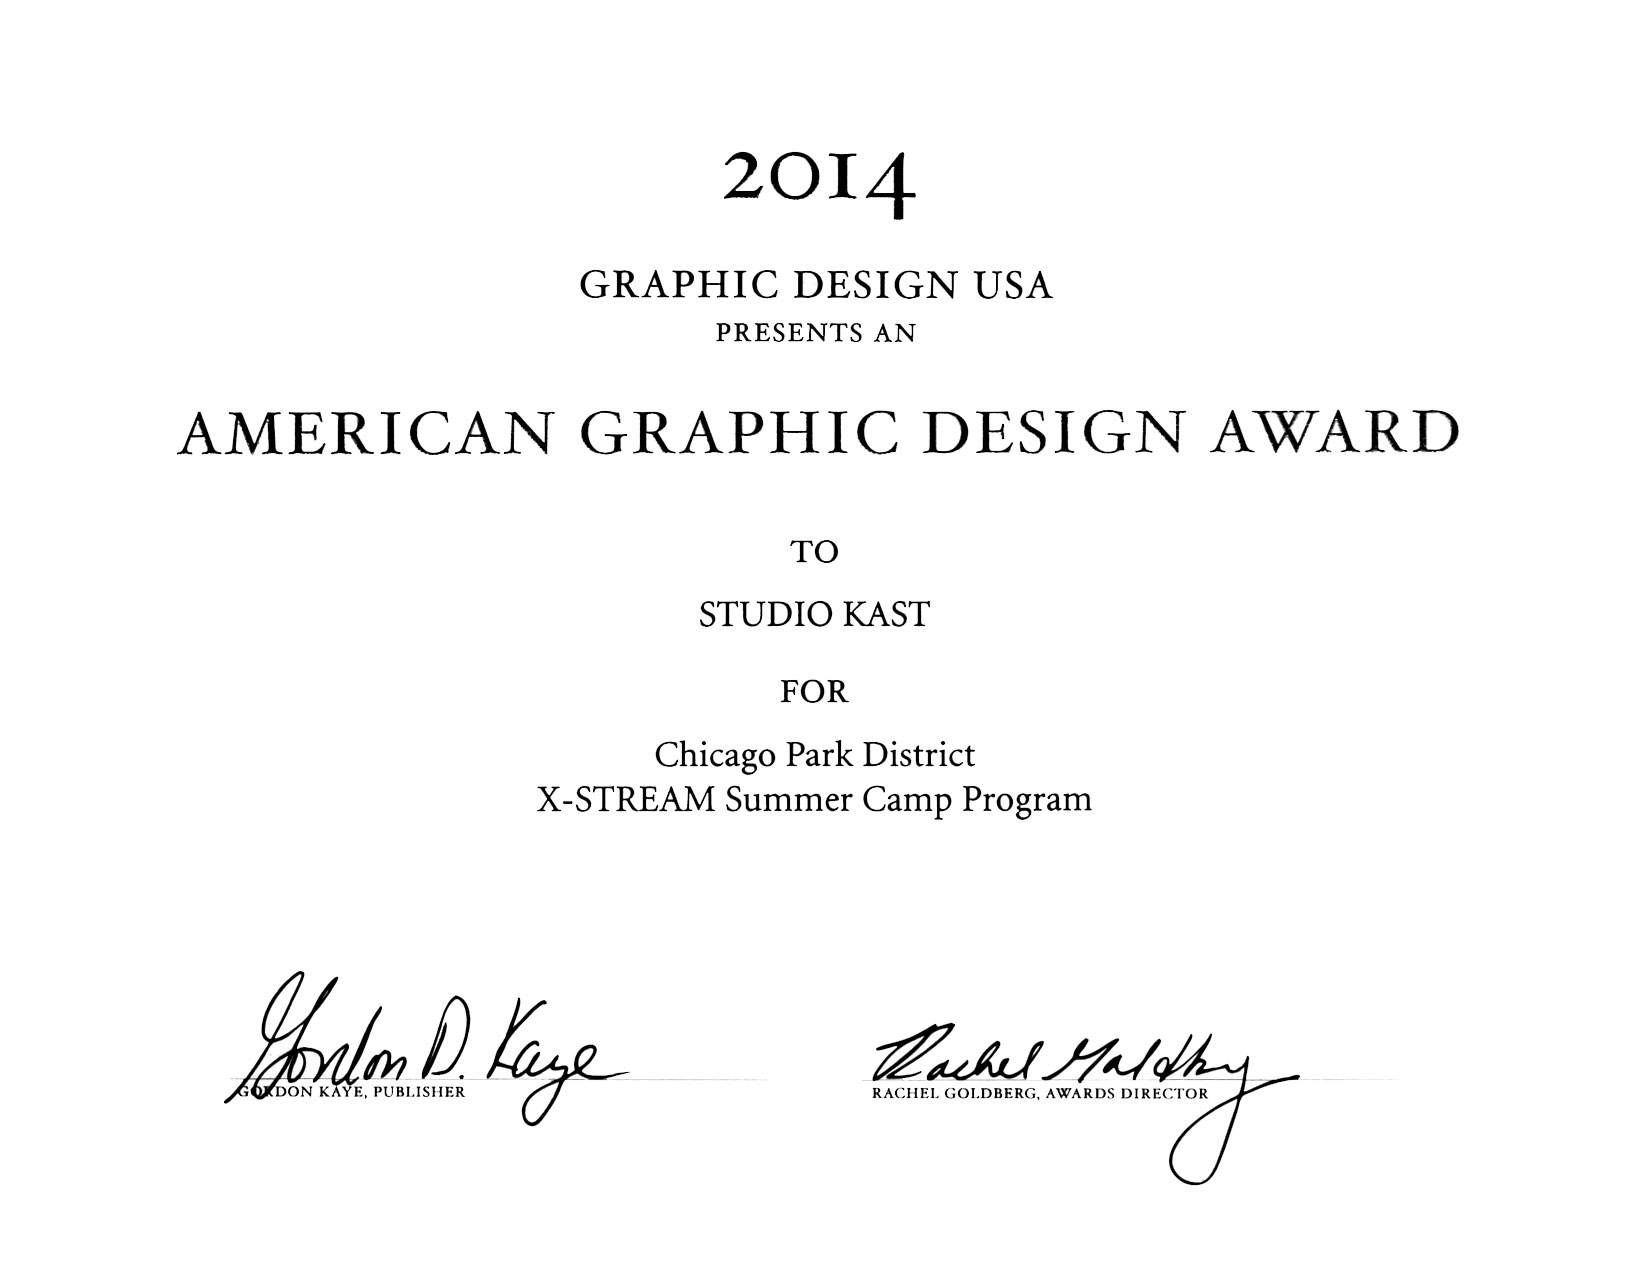 2014 AMERICAN GRAPHIC DESIGN AWARD